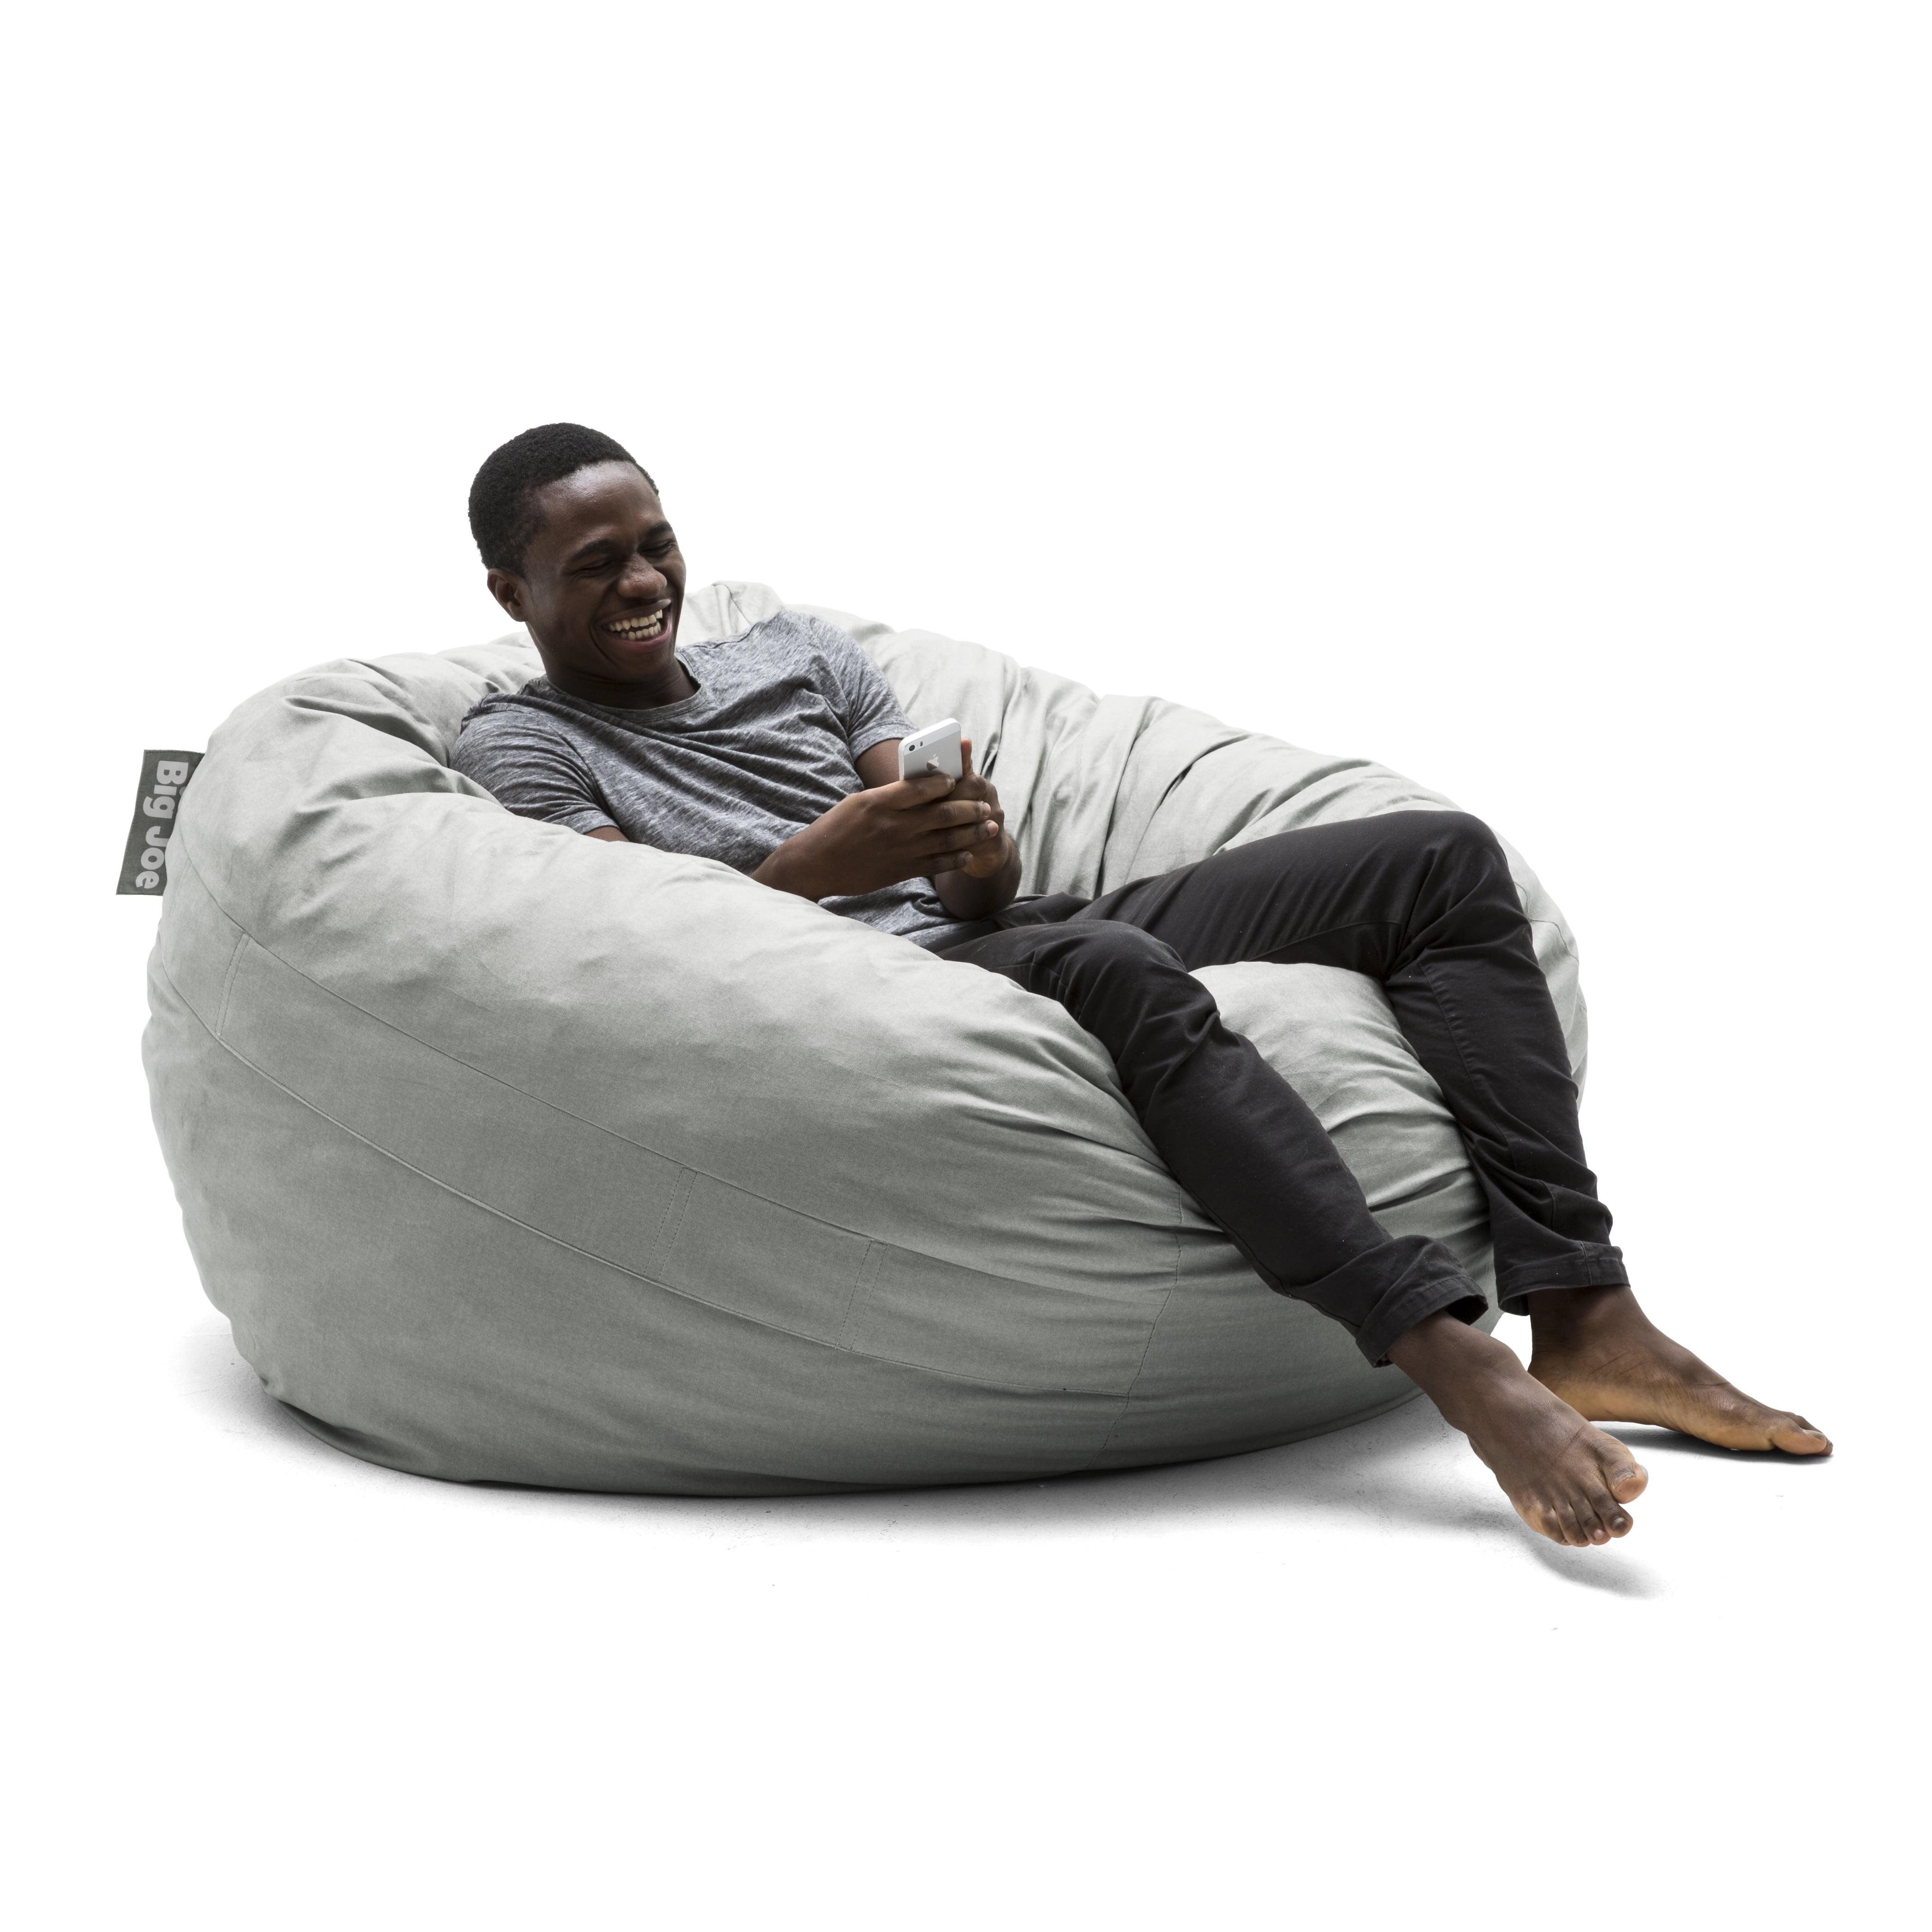 Big Joe King 5 Fuf Bean Bag Chair Multiple Colors